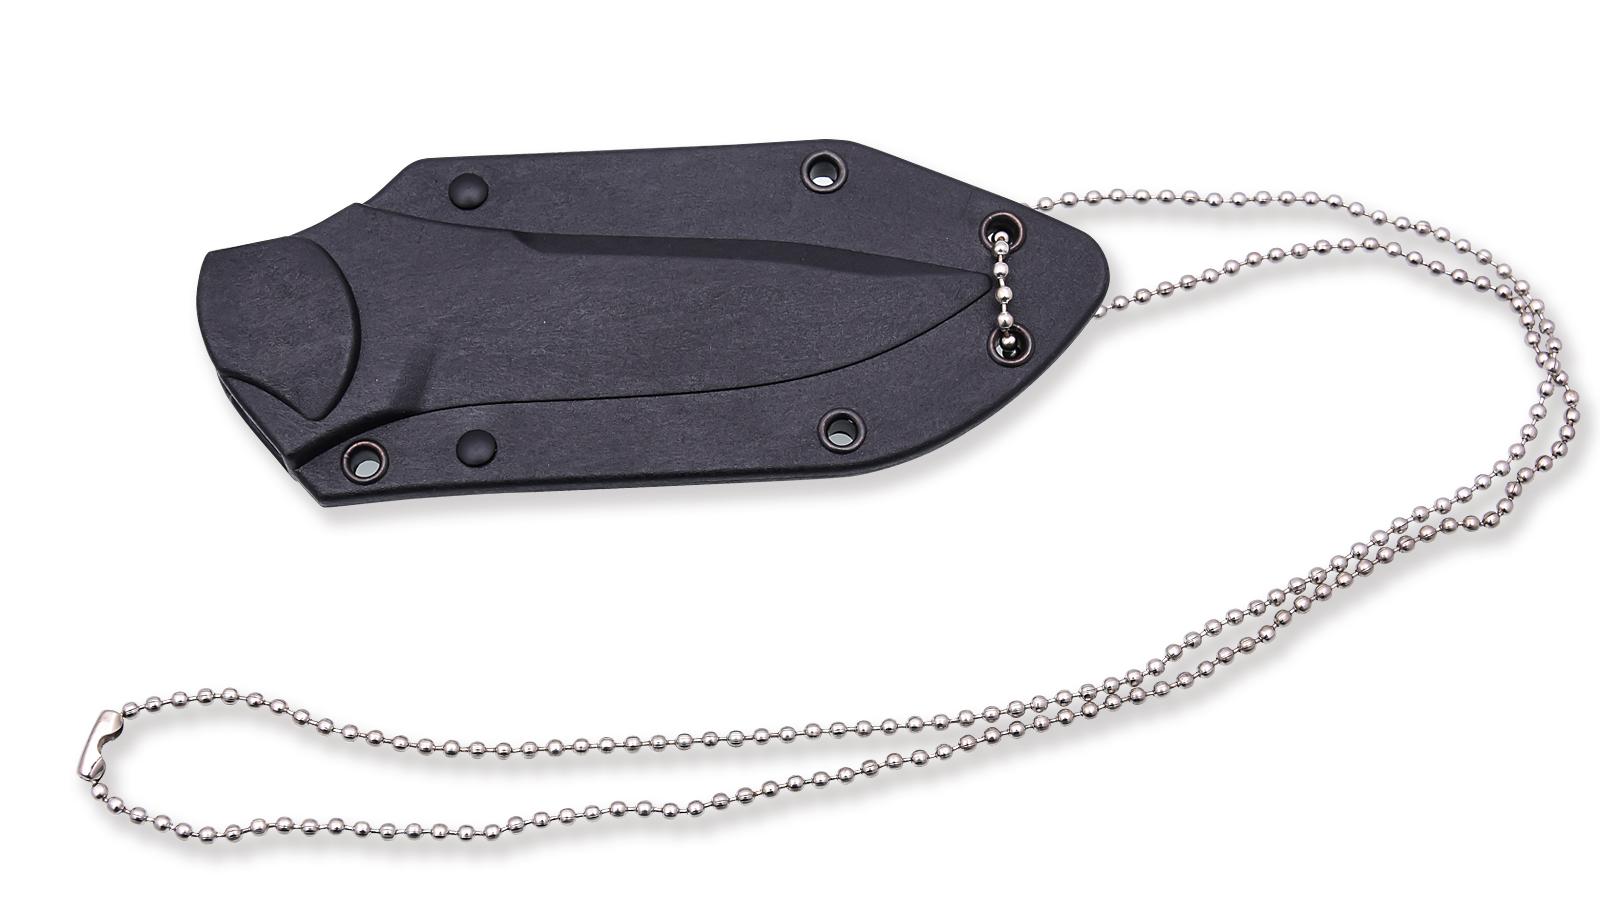 Нож Timberline Mini Pit Bull с доставкой